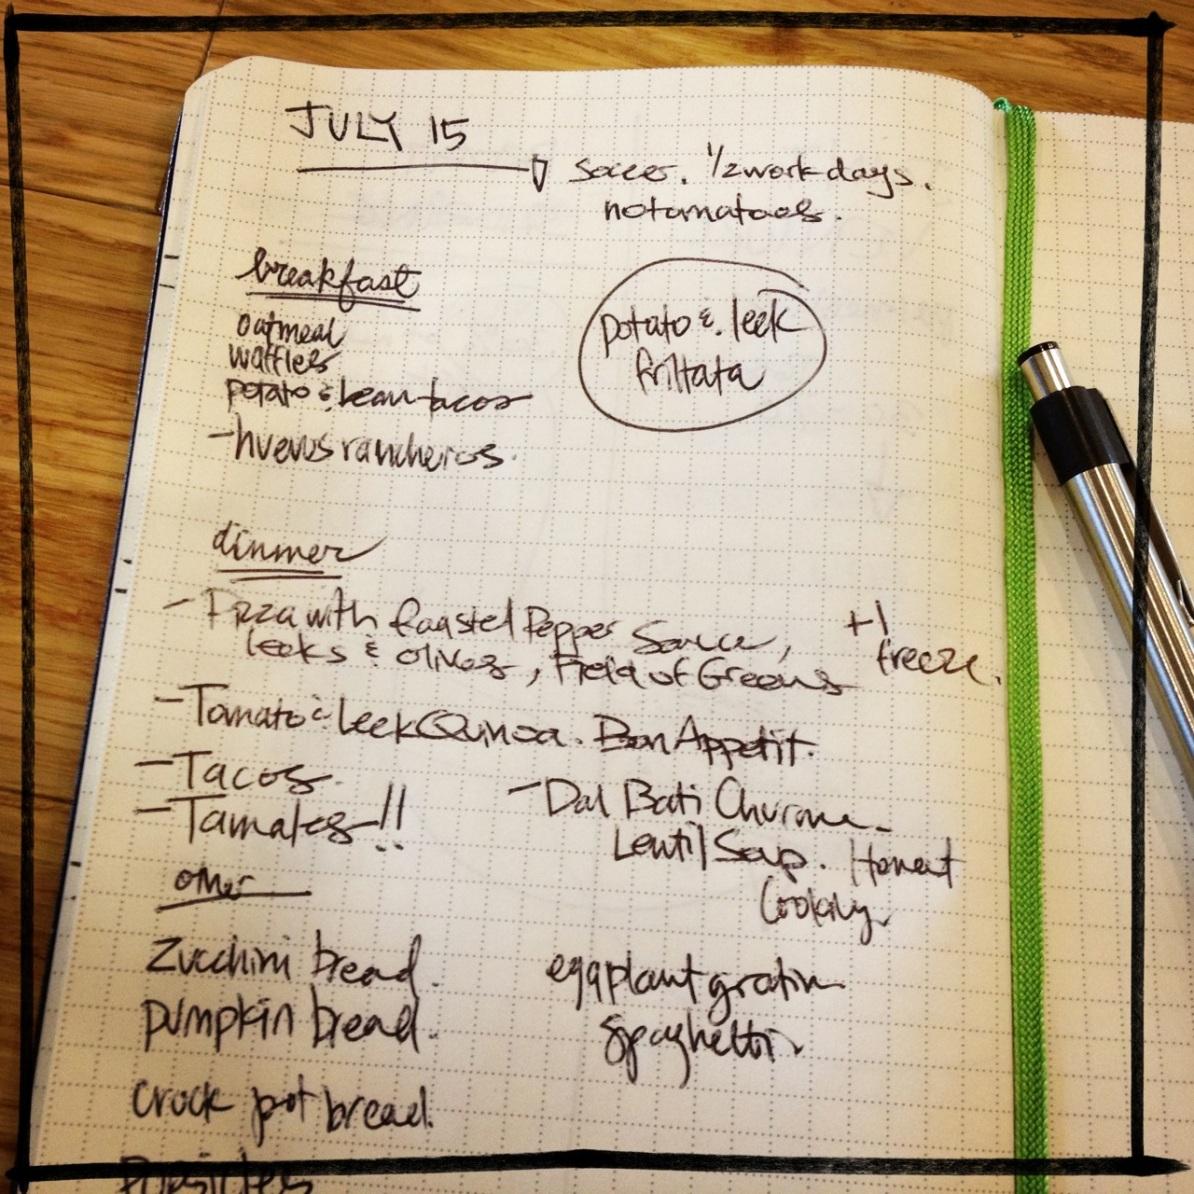 veggie meal plan | aneelee.wordpress.com